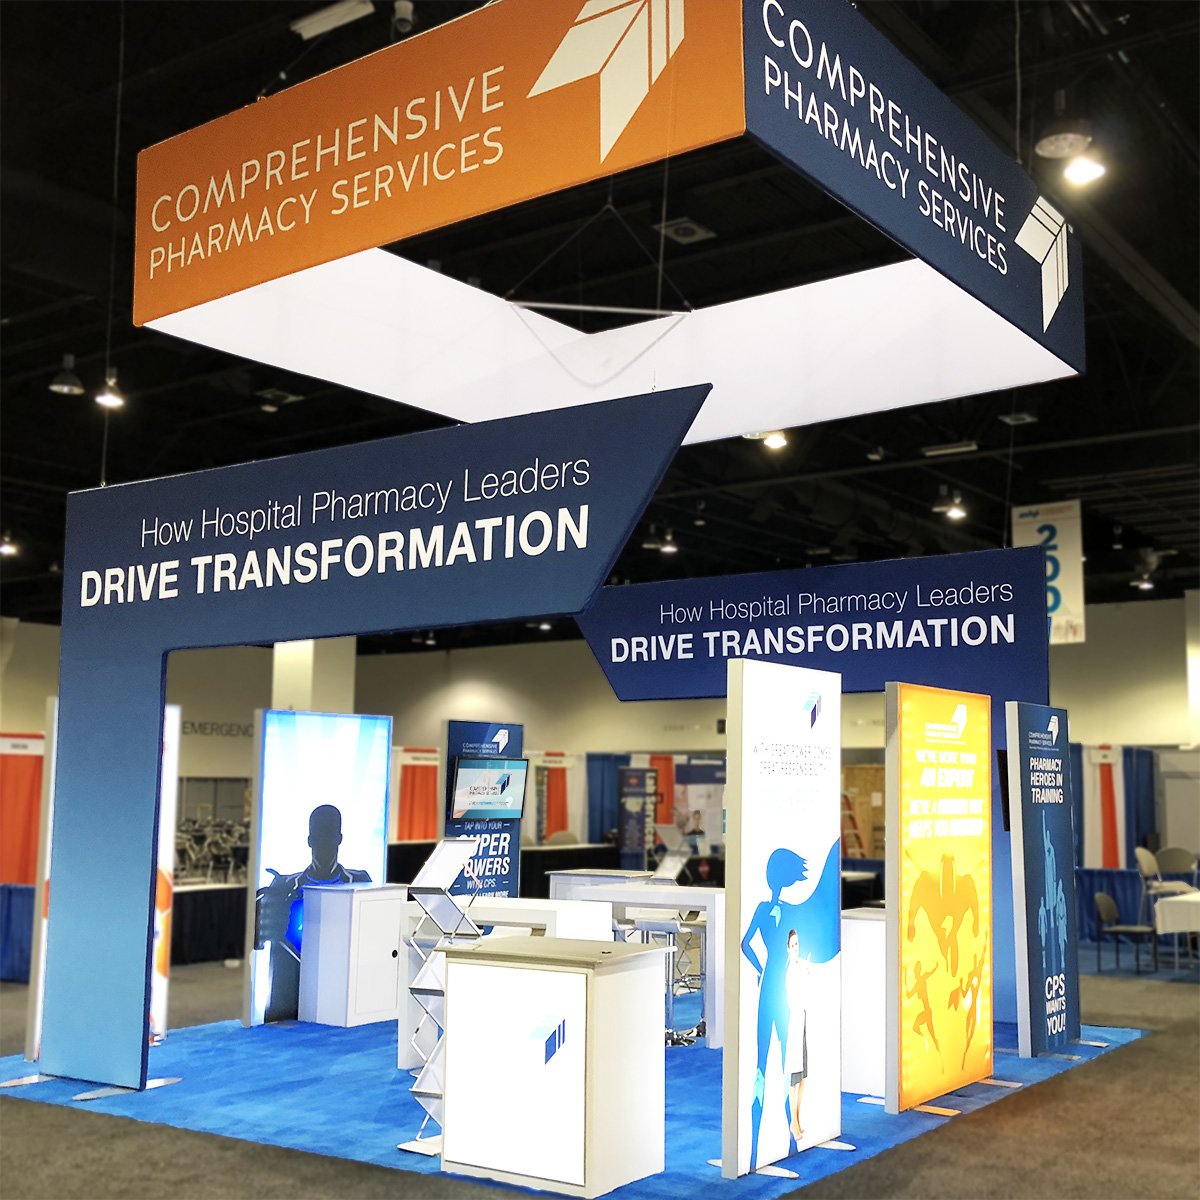 comprehensive pharmacy services trade show exhibit